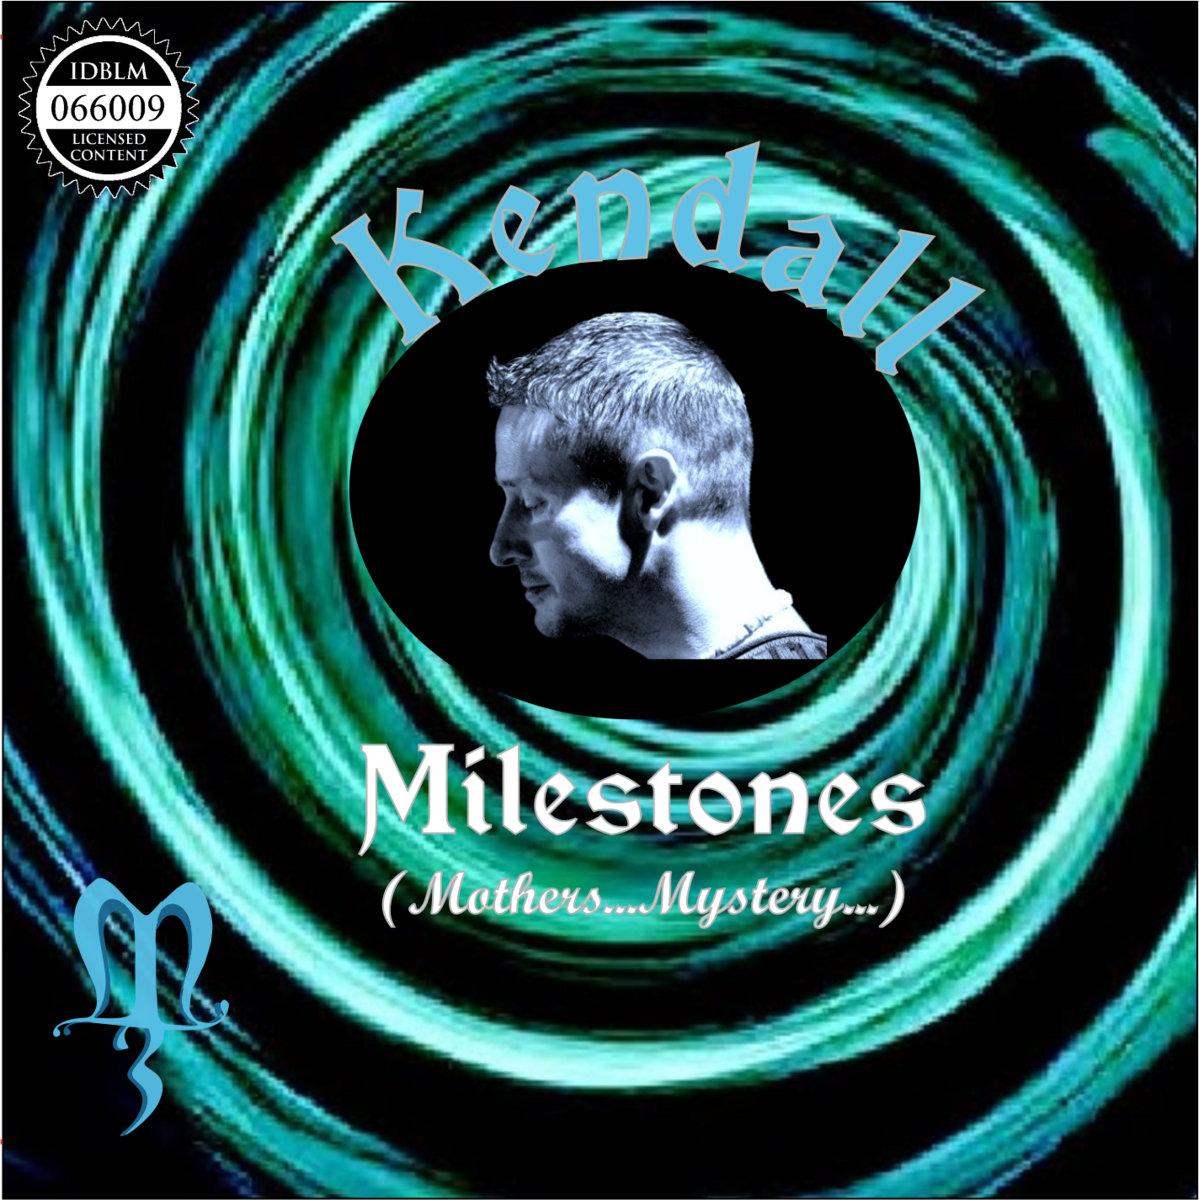 MILESTONES (Mothers...Mystery...) | Kendall Partington